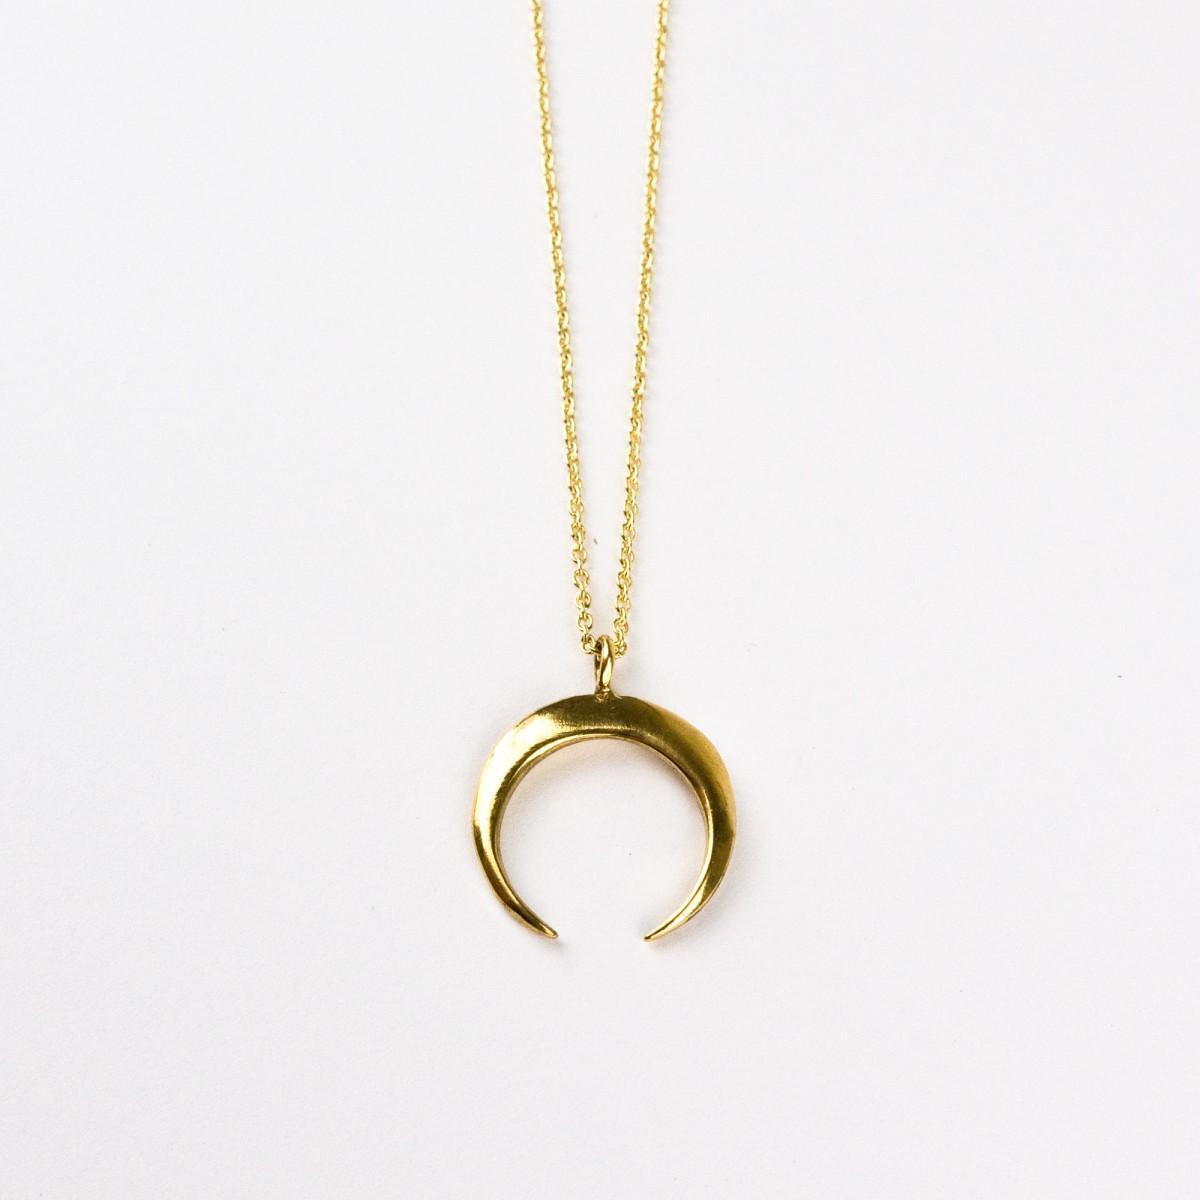 ST'ATOUR LUNA I – Kette mit Halbmond in Gold, Silber oder Roségold